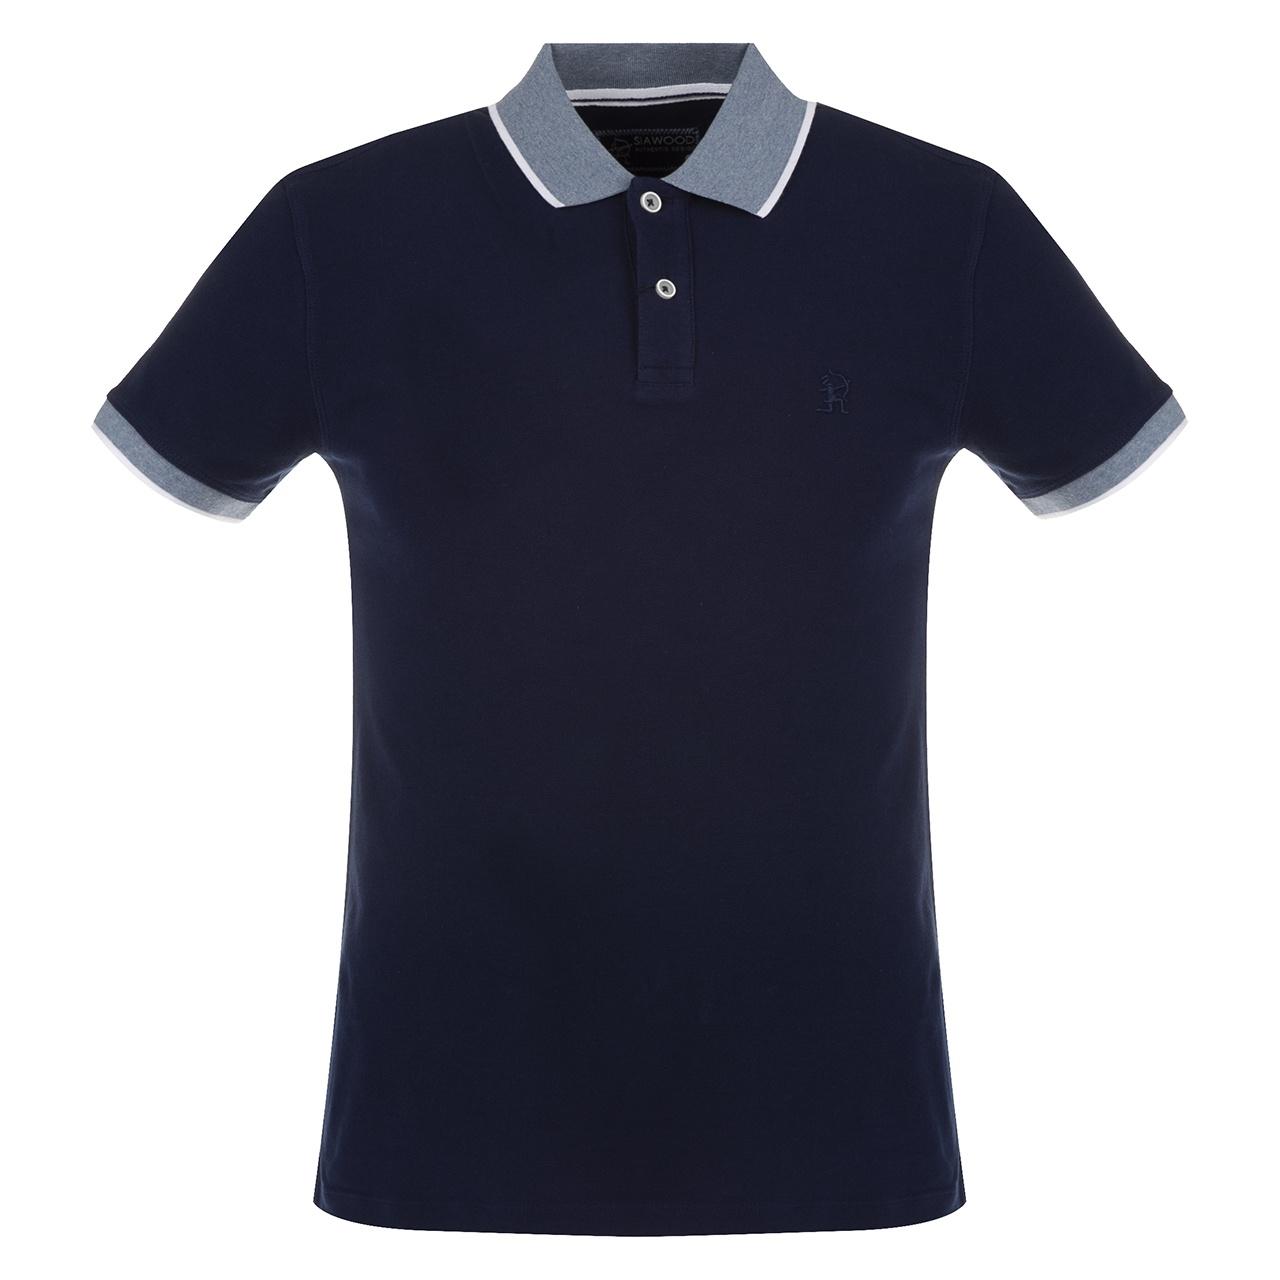 Photo of پولو شرت مردانه سیاوود مدل POLO-62811-62811 کد S0180 رنگ سرمه ای